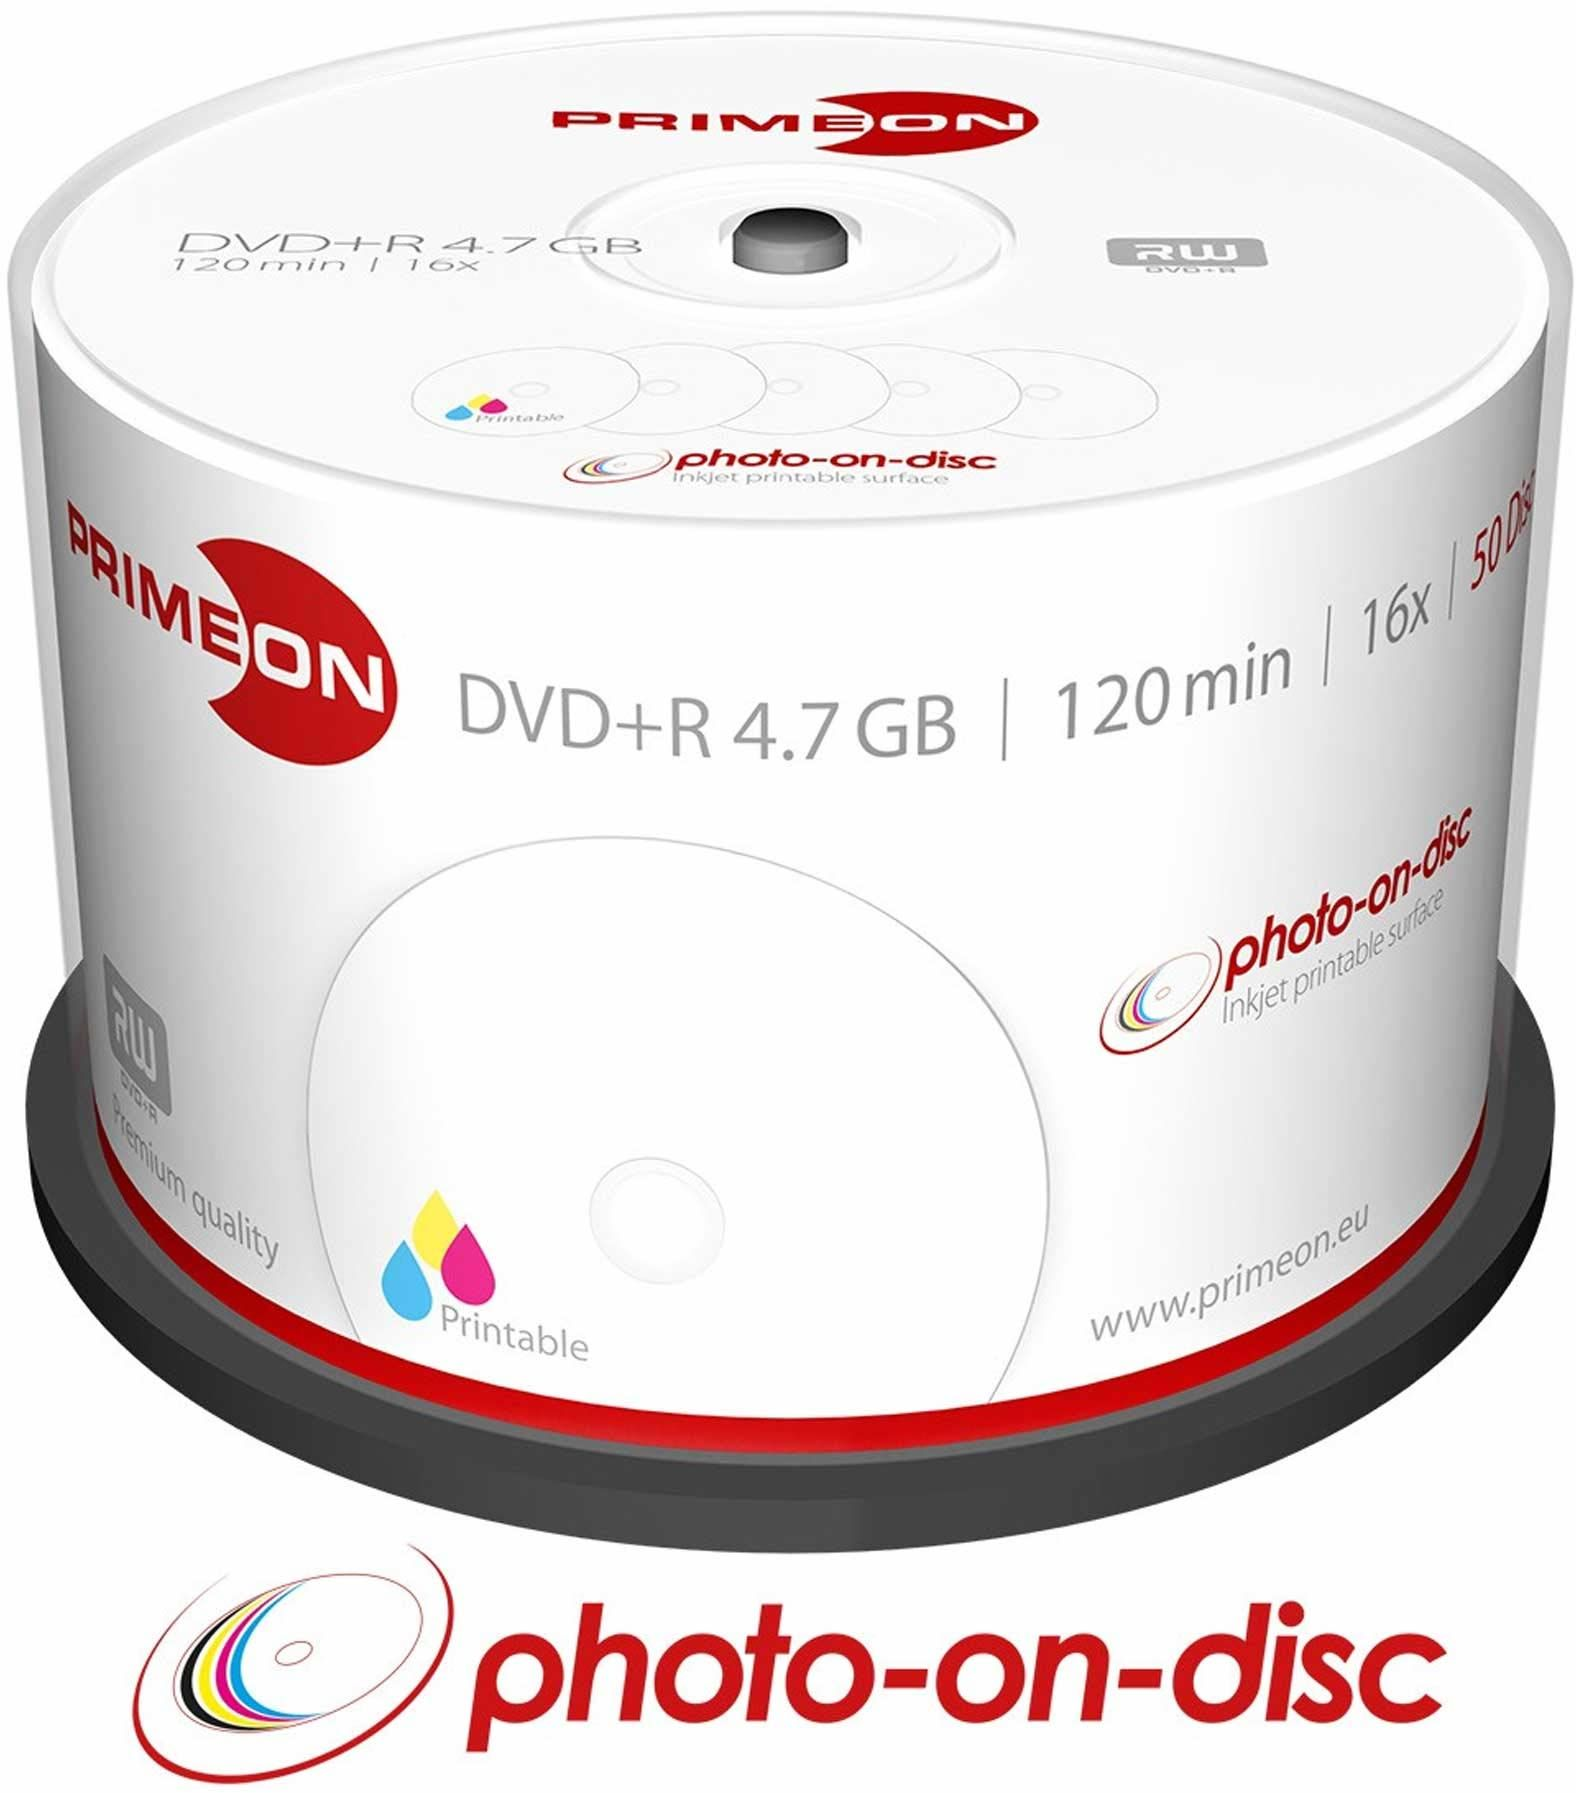 PRIMEON DVD+R 4,7 GB/120 min/16 x pudełko na kanapki (50 płytek), płyta foto-on-disc Surface, Inkjet Fullsize Printable